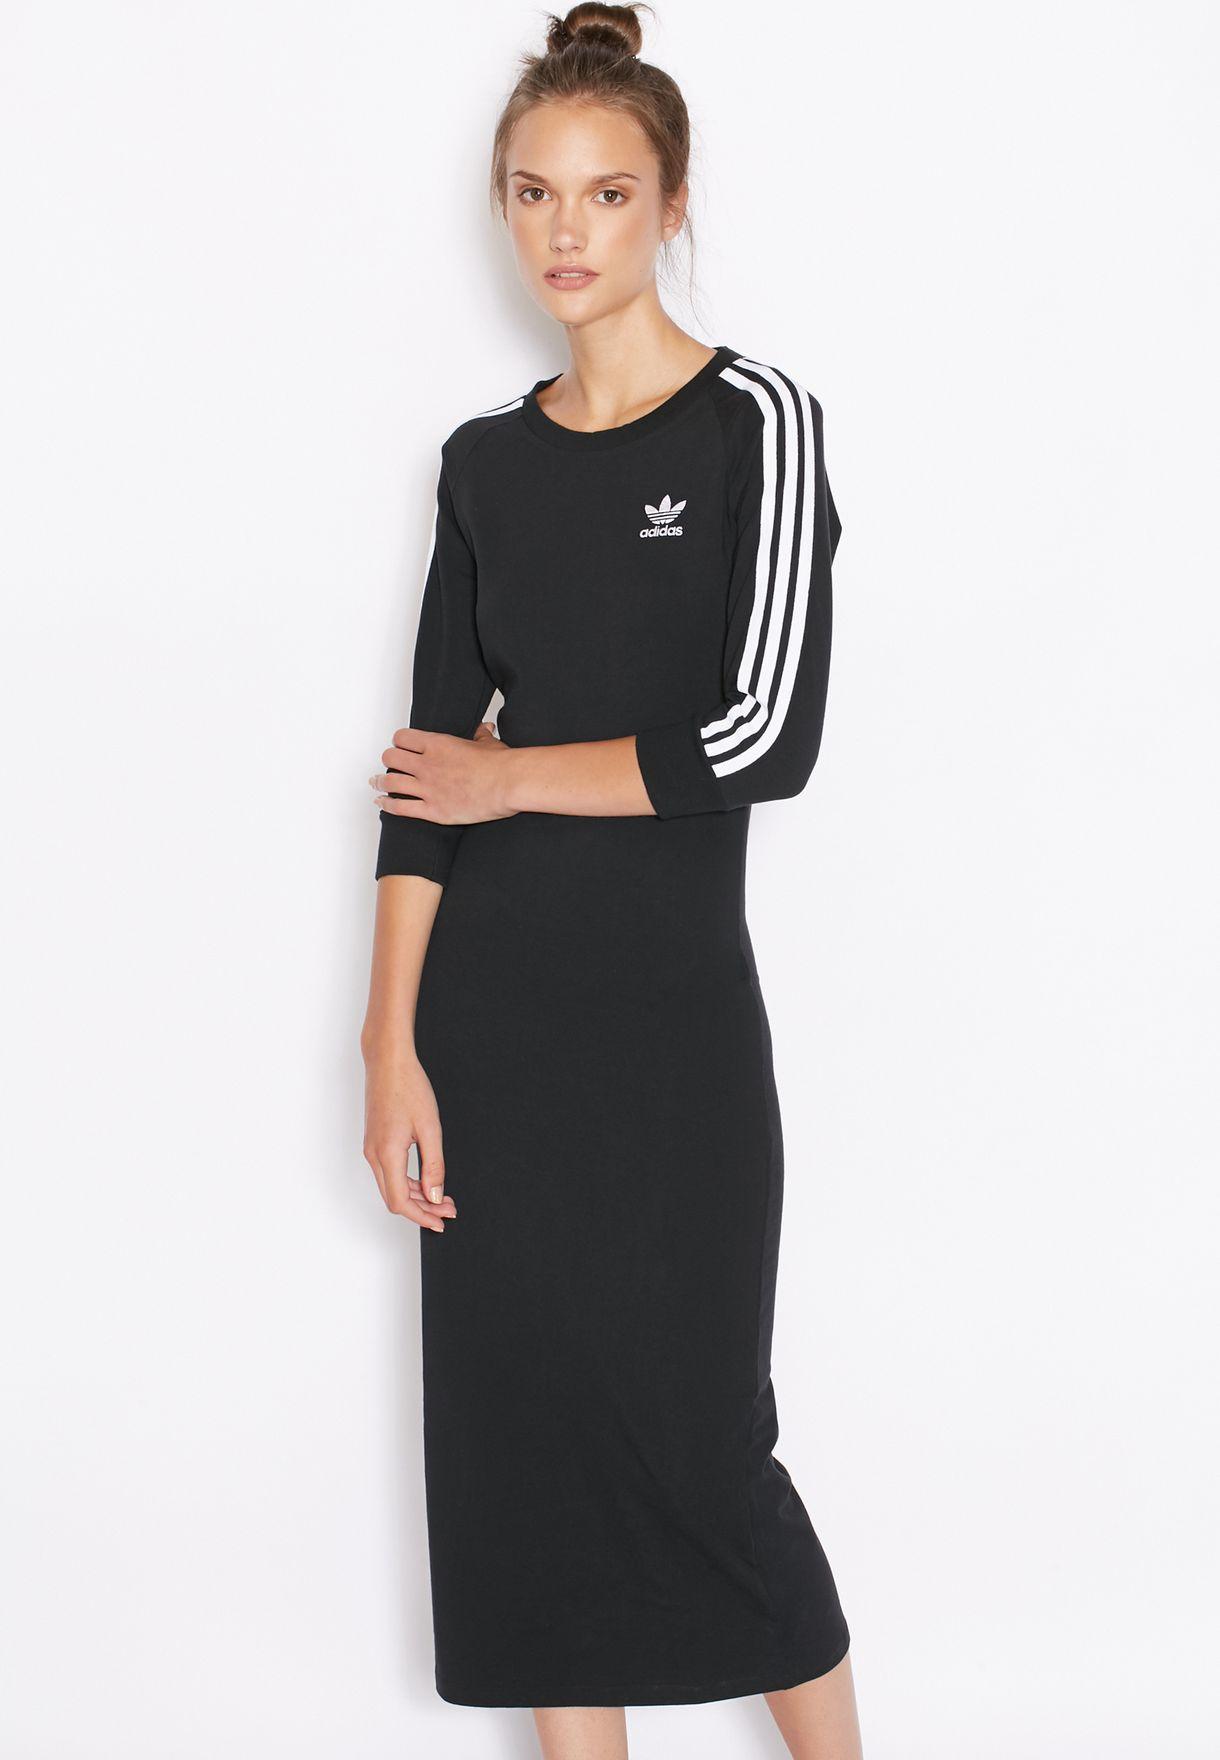 eaa2c602d9c7 Shop adidas Originals black 3 Stripe Dress AY5251 for Women in Qatar ...